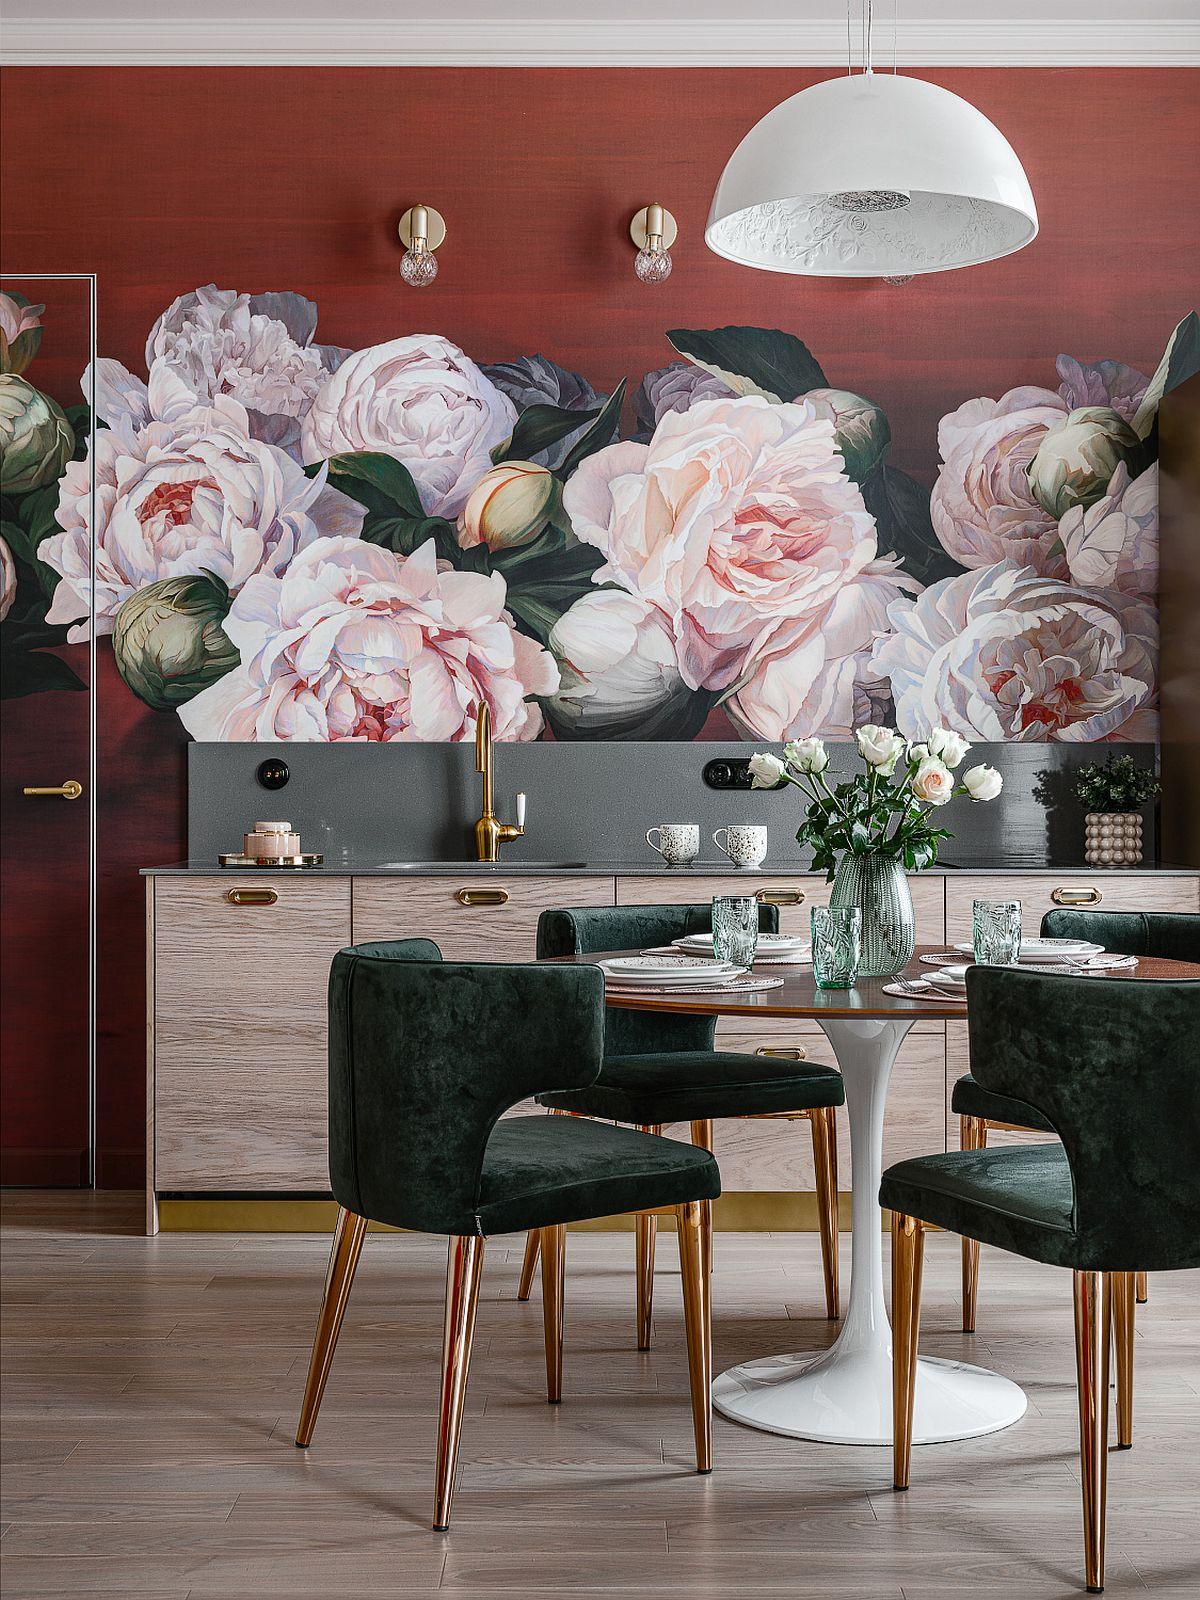 adelaparvu.com despre bucatarie cu tapet cu flori, designer Iulia Sheypunas, foto Vladimir Barabash (4)